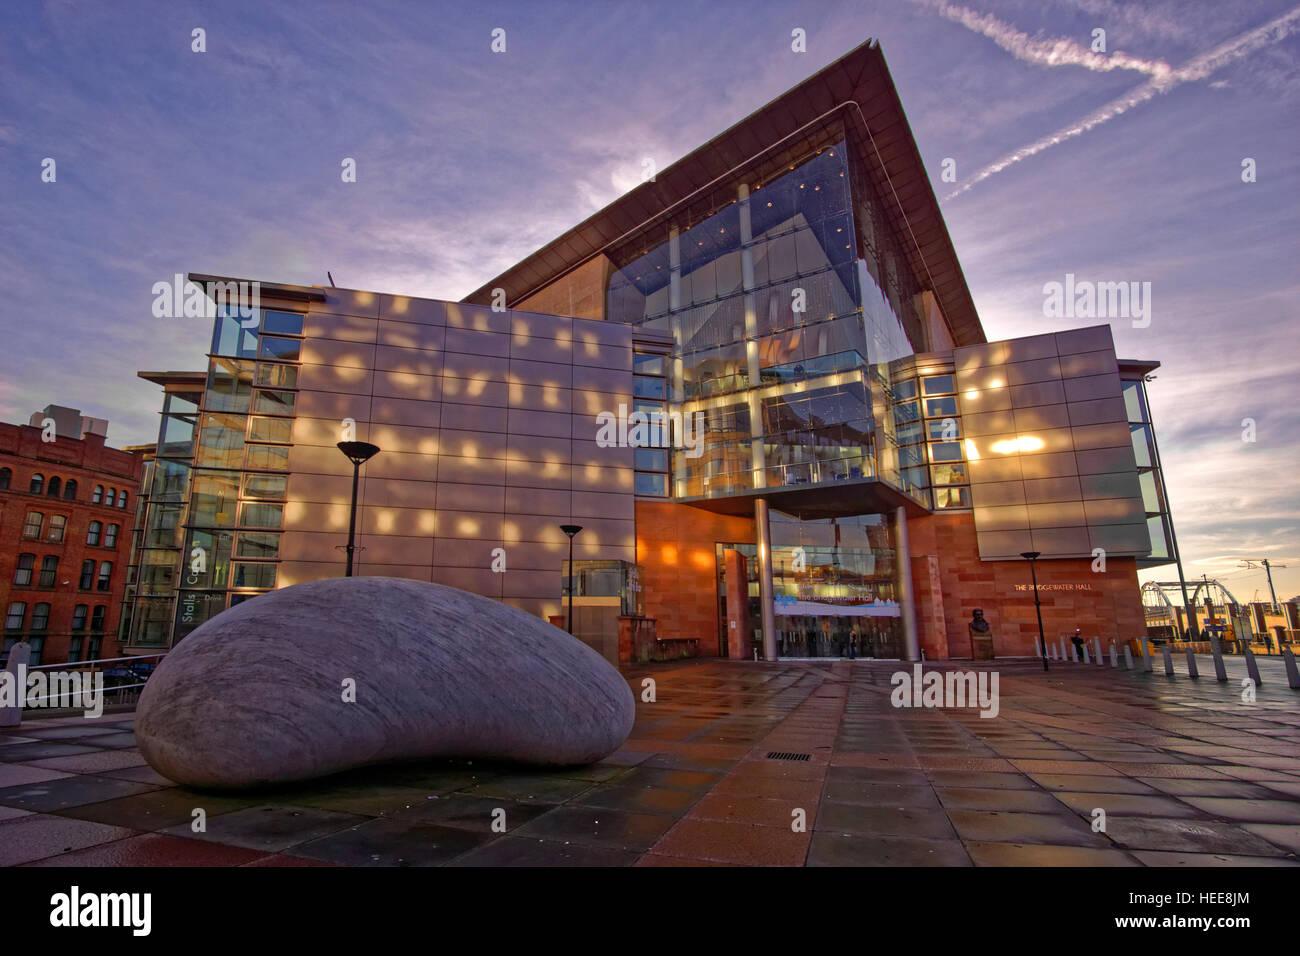 The Bridgewater Concert Hall, Manchester City Centre, Manchester, Greater Manchester, England. - Stock Image